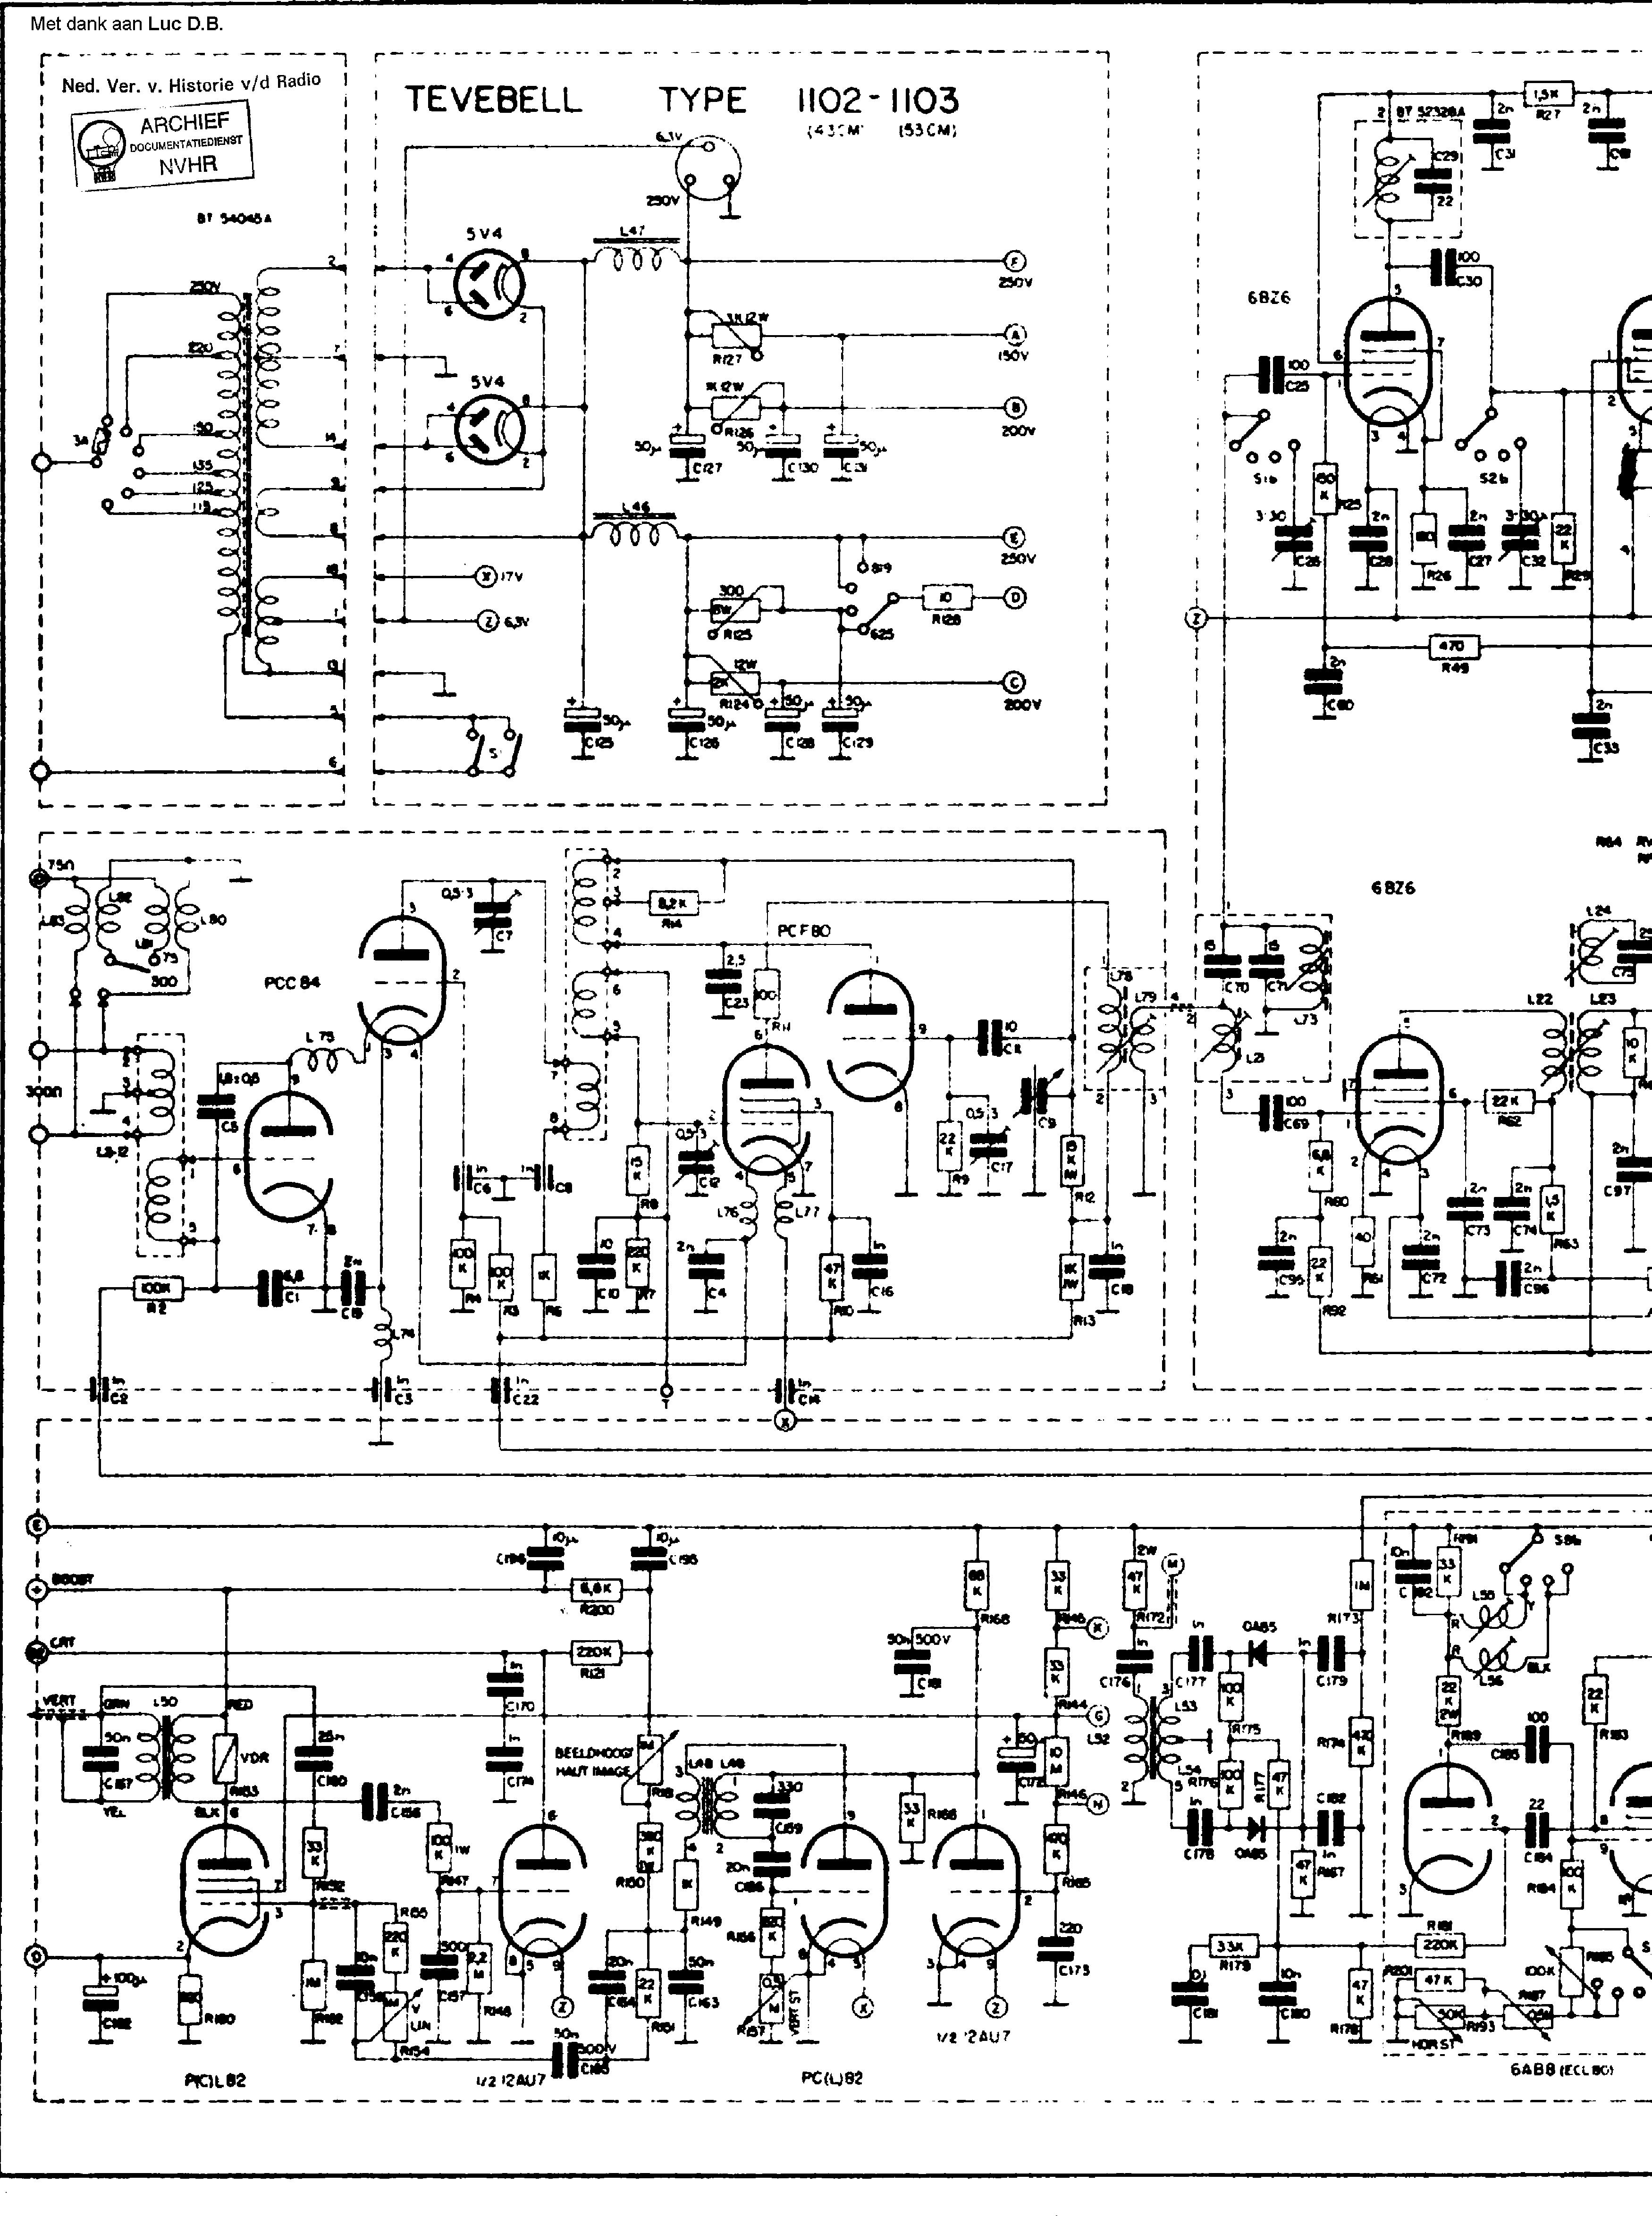 radiobell tv1102 tv receiver sch service manual download schematics Motherboard Schematic Diagram radiobell tv1102 tv receiver sch service manual 1st page